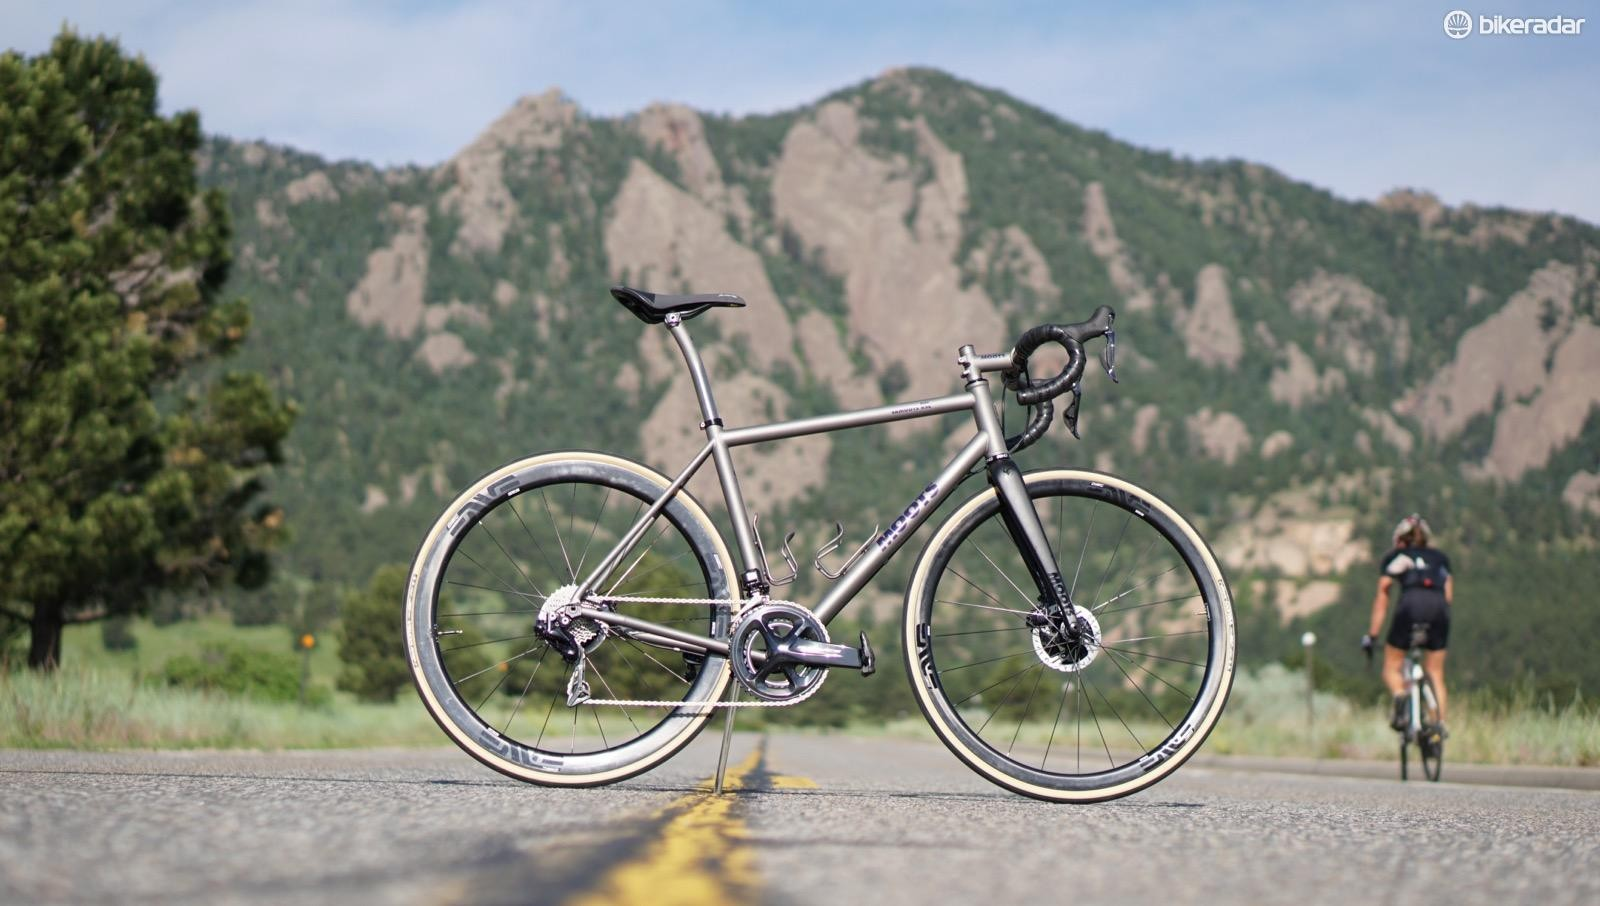 11spd: This week's best bike gear - BikeRadar